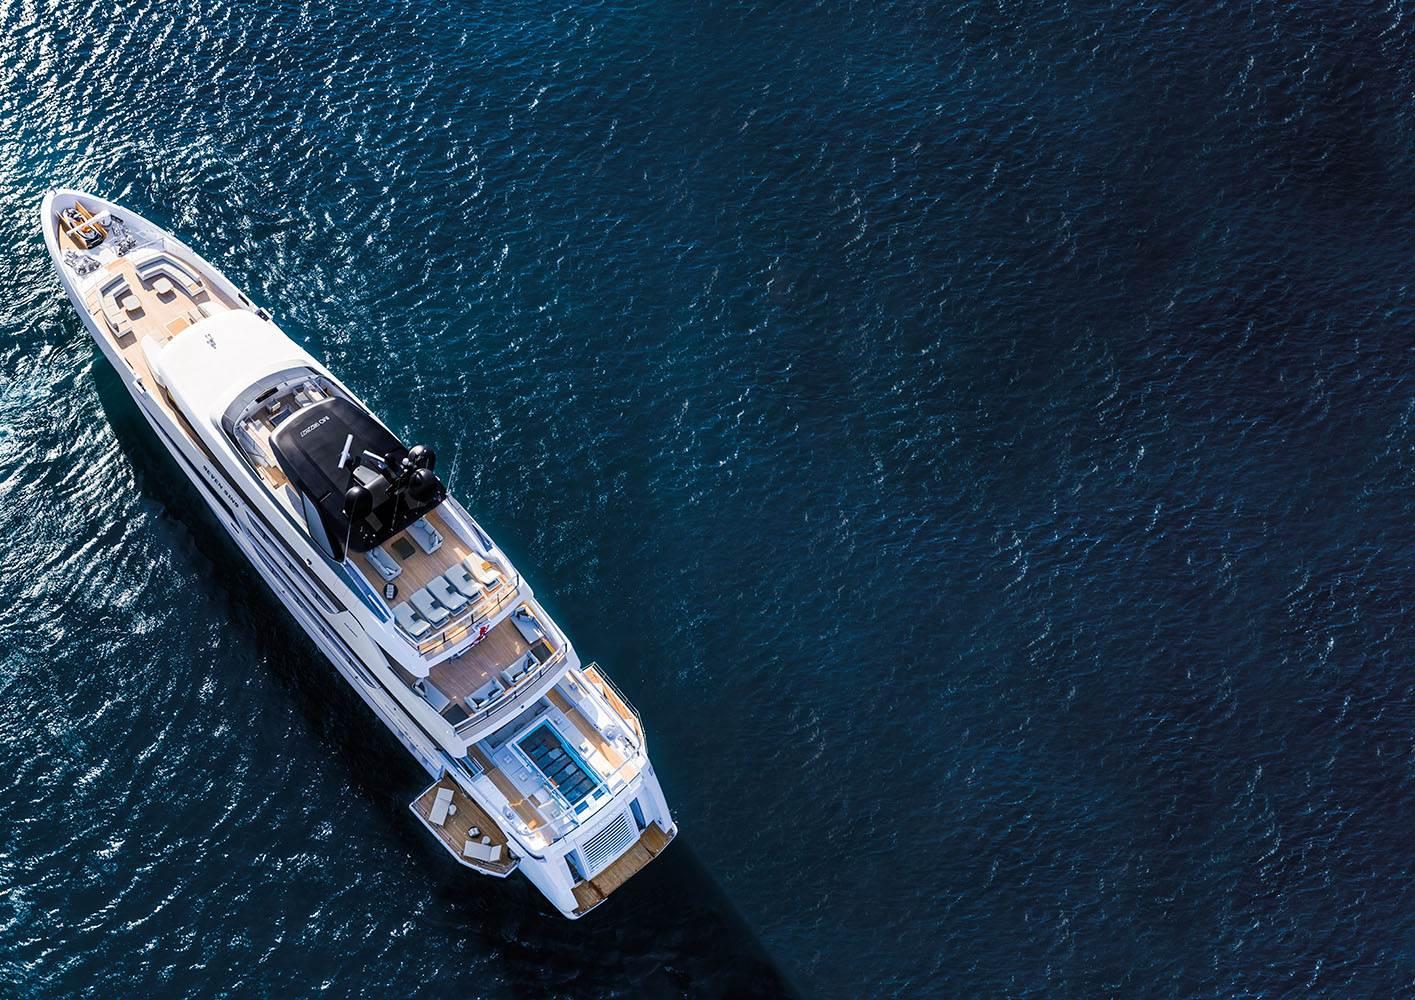 Yacht seven sins yachting it